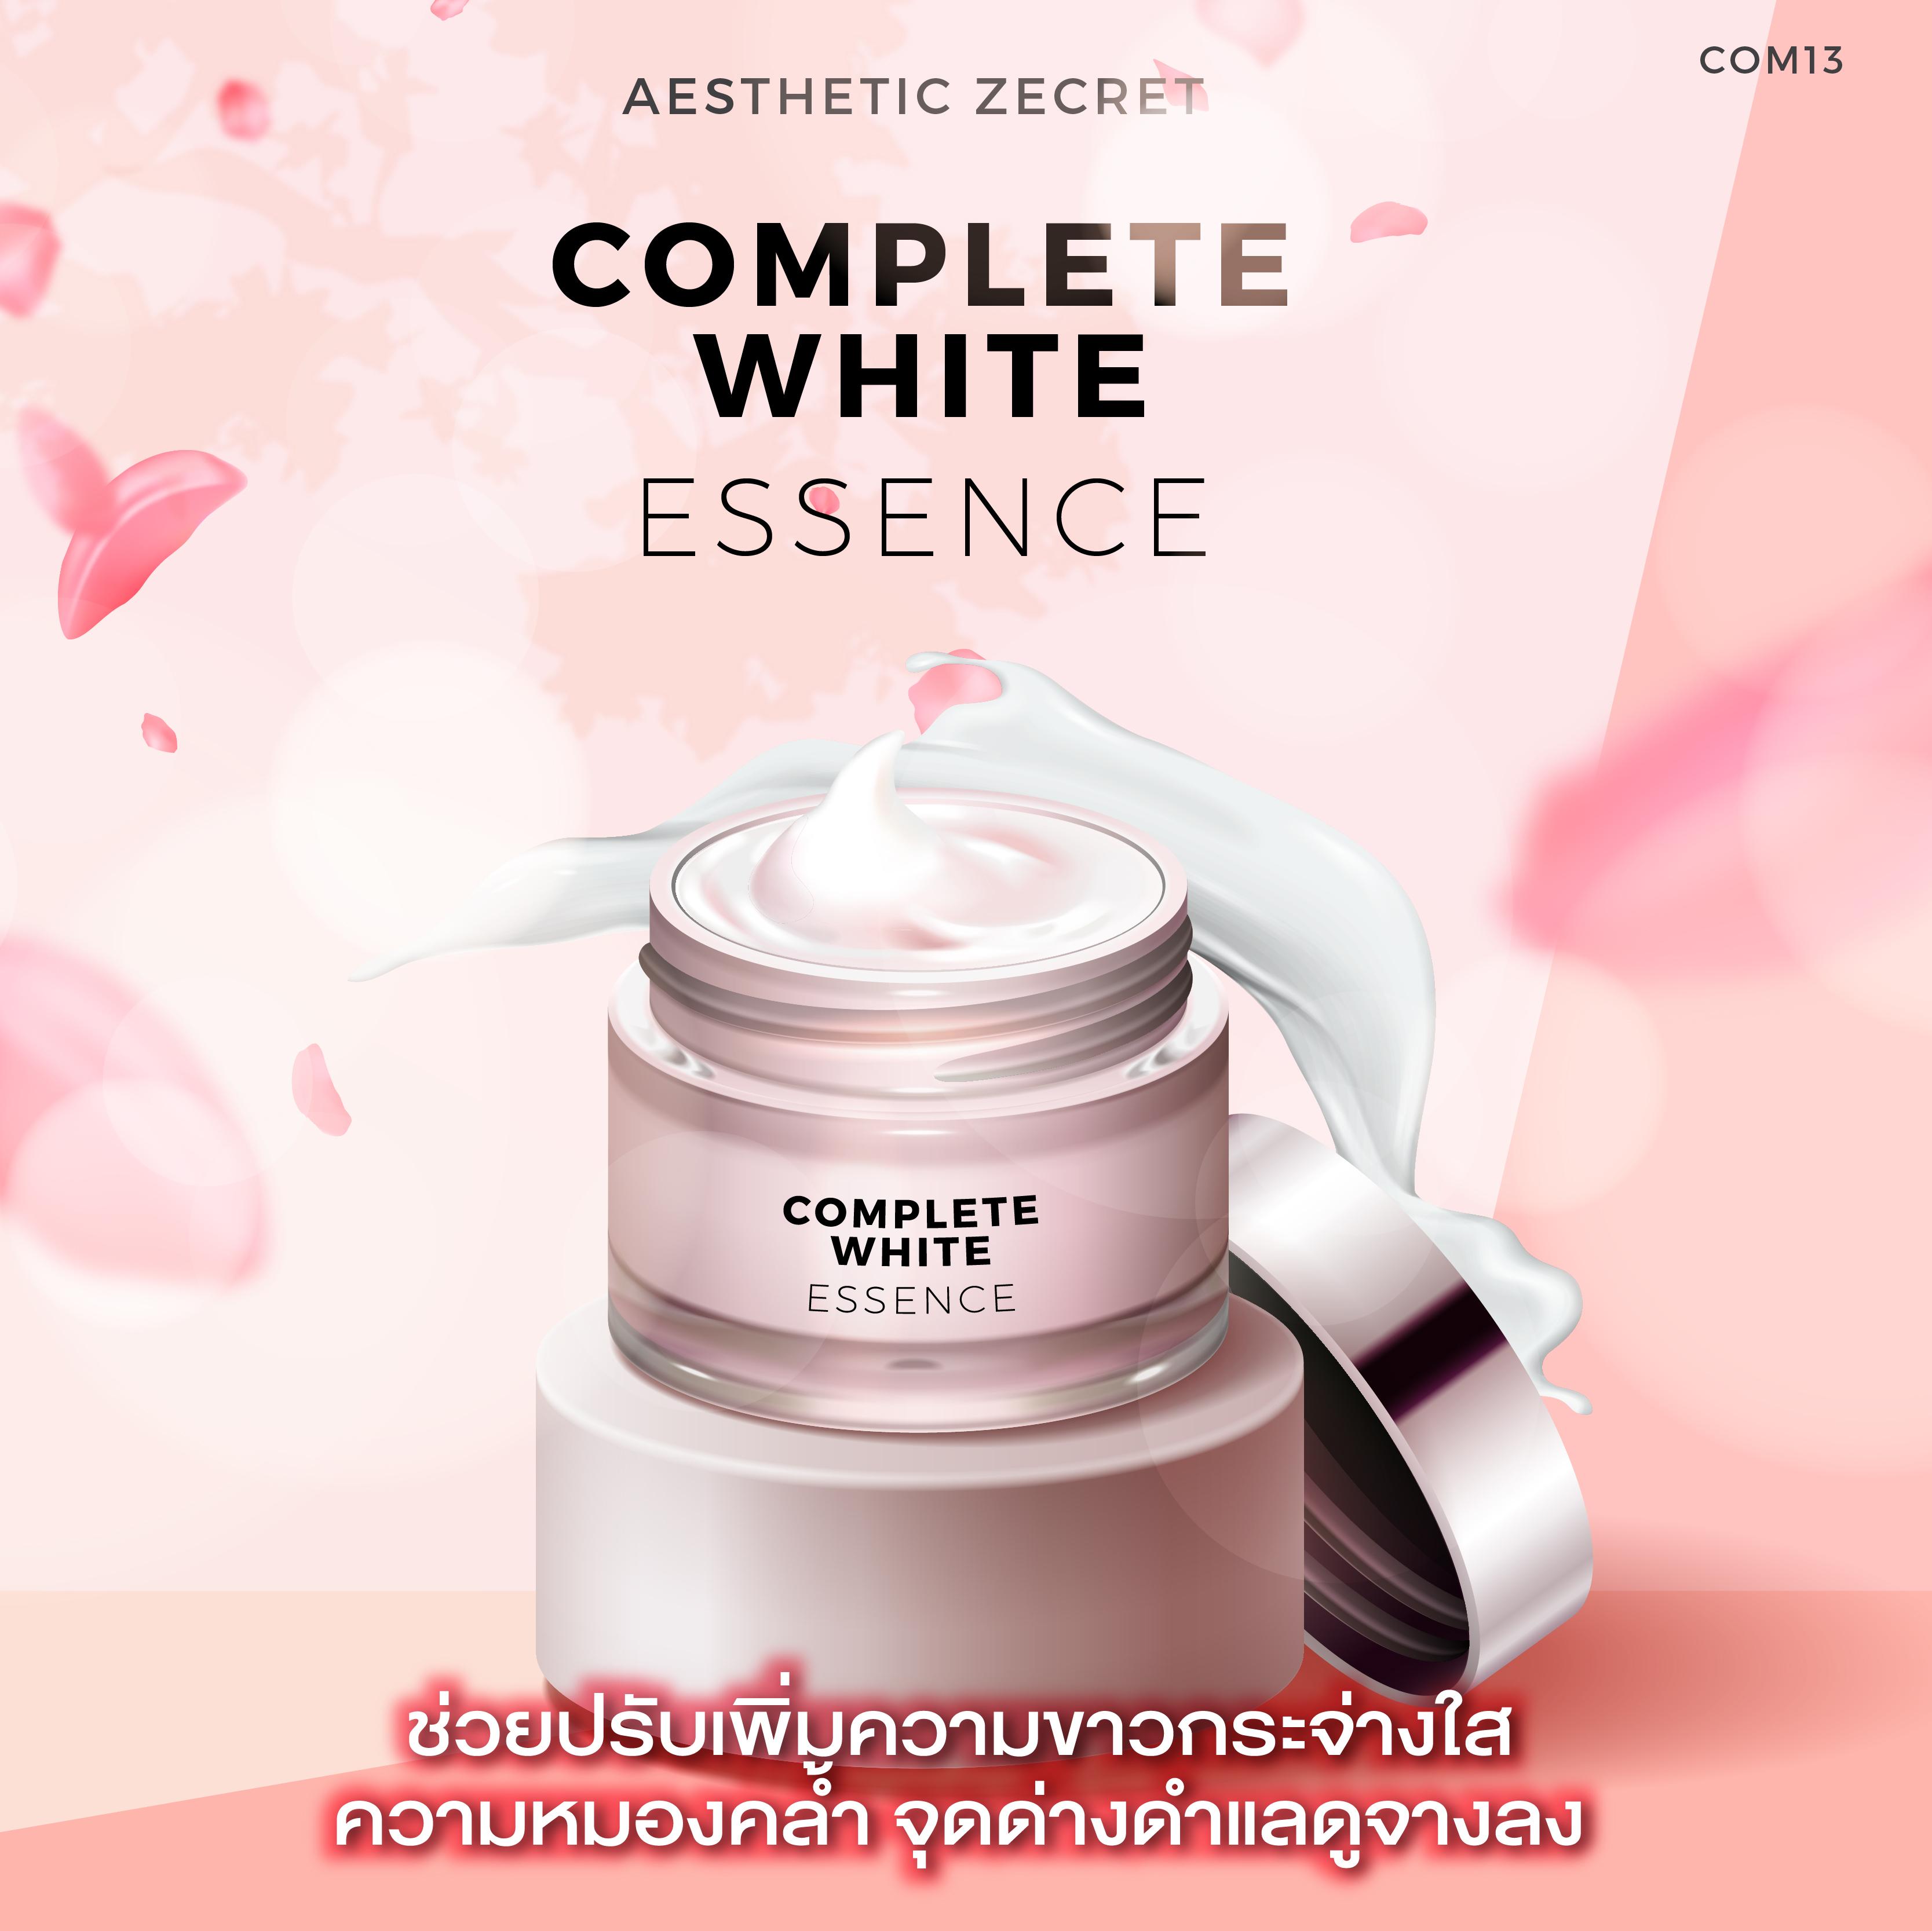 COMPLETE WHITE ESSENCE